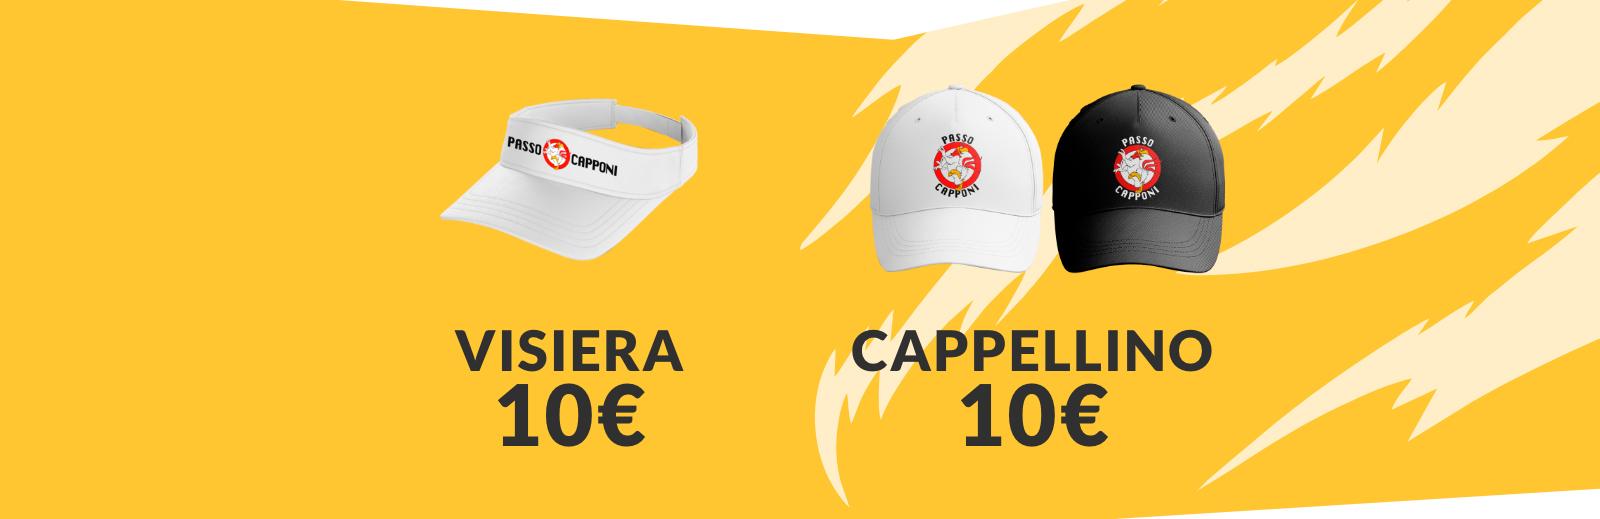 PZ Sport - Passo Capponi: Cappellino Malaga, Visiera, Cappellino